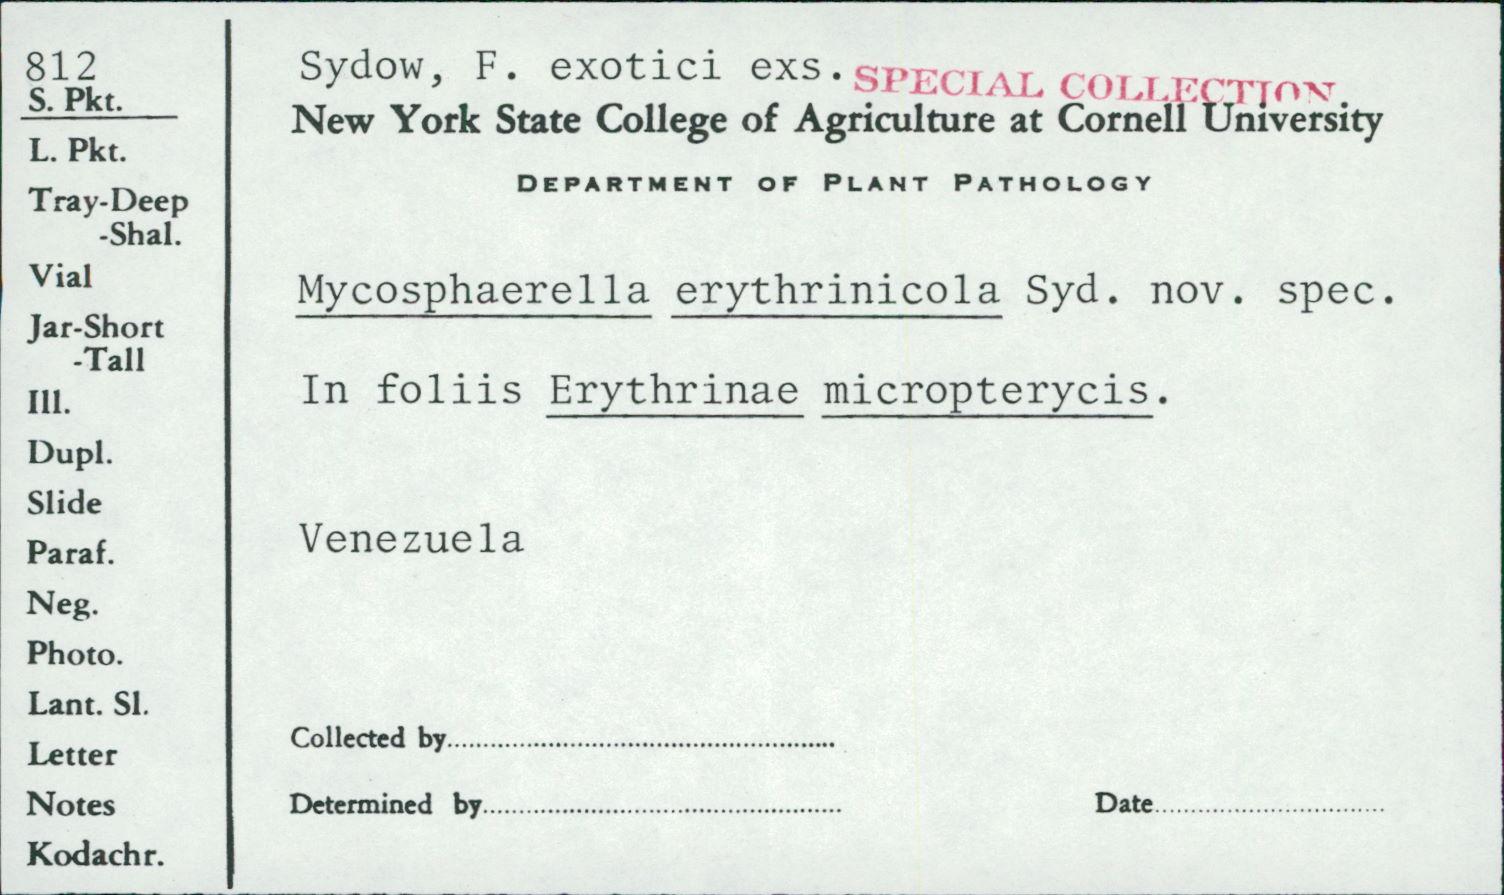 Mycosphaerella erythrinicola image